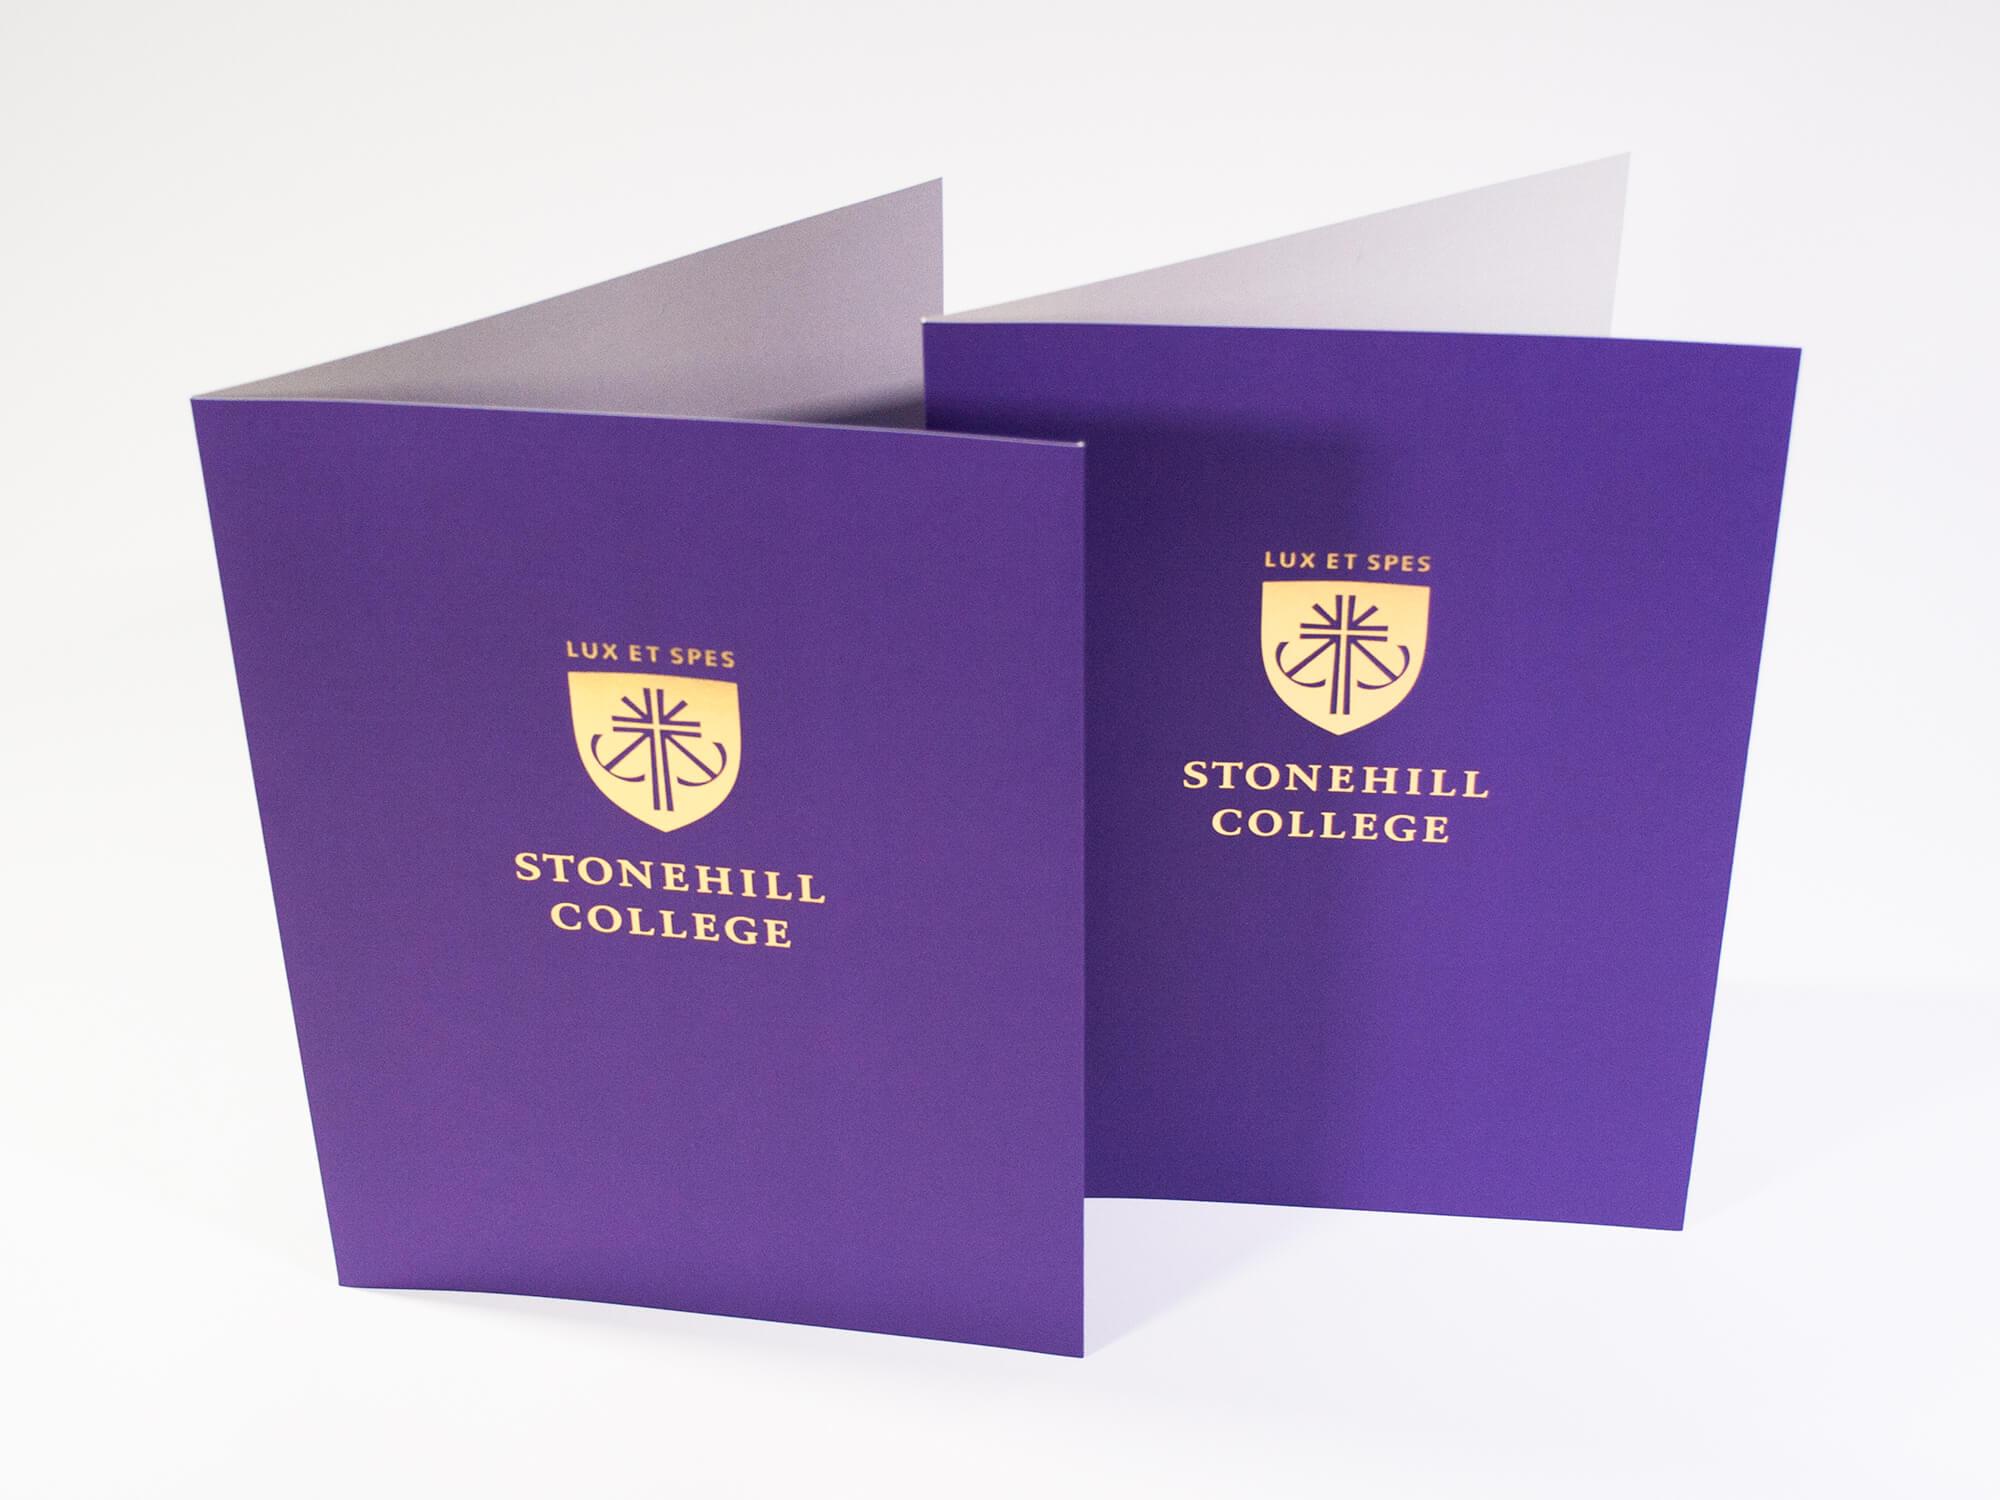 Metallic gold foil stamping  applied to pocket folder